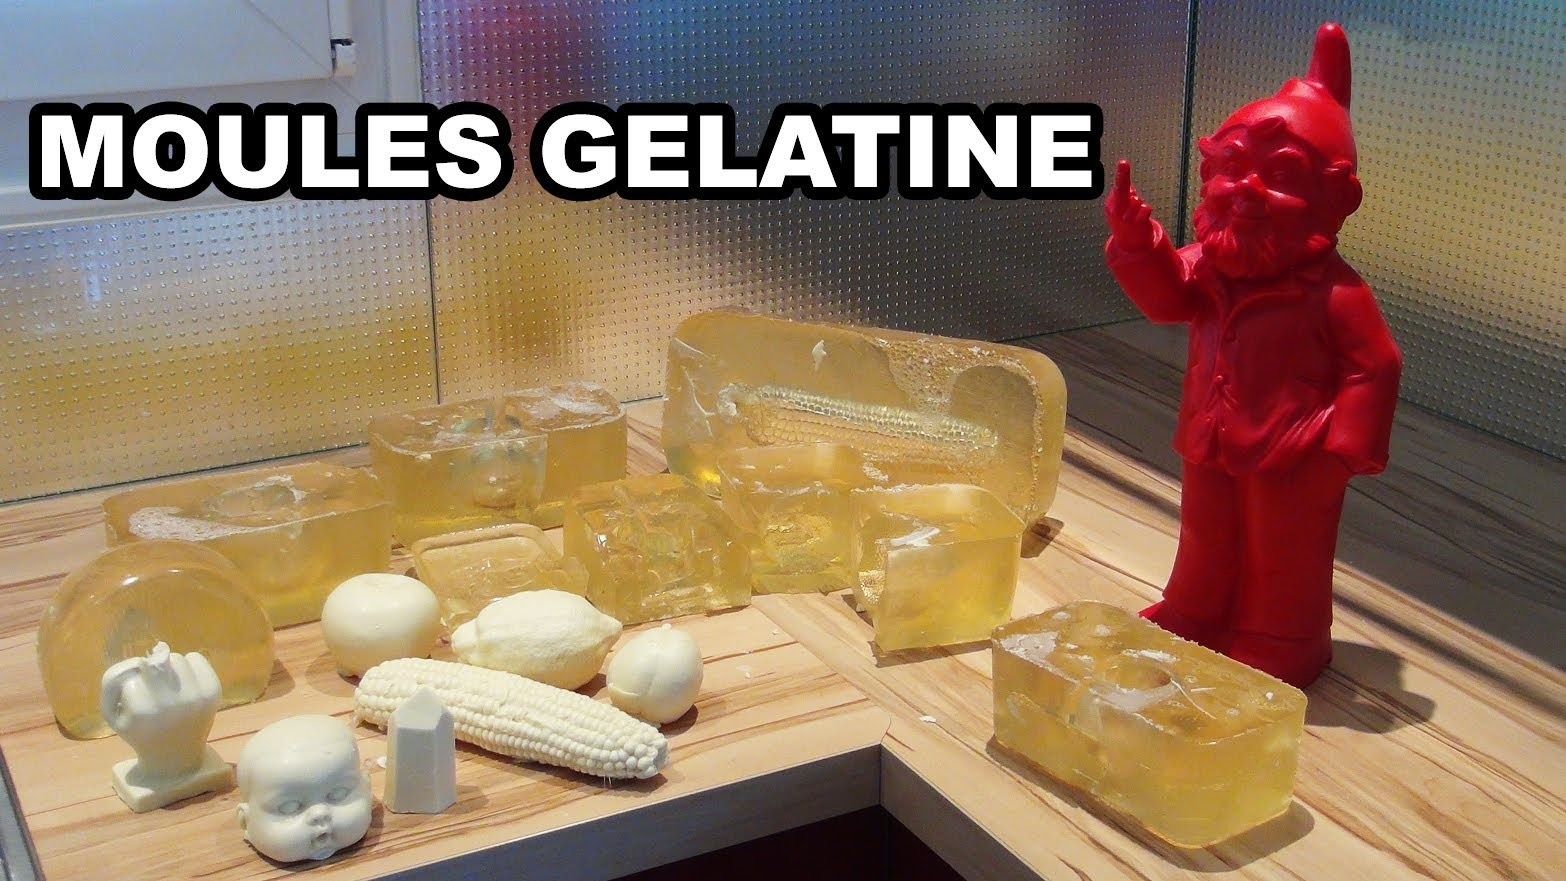 Moule gélatine - How to do gelatine mold - pâtisserie - cuisine - Albarock